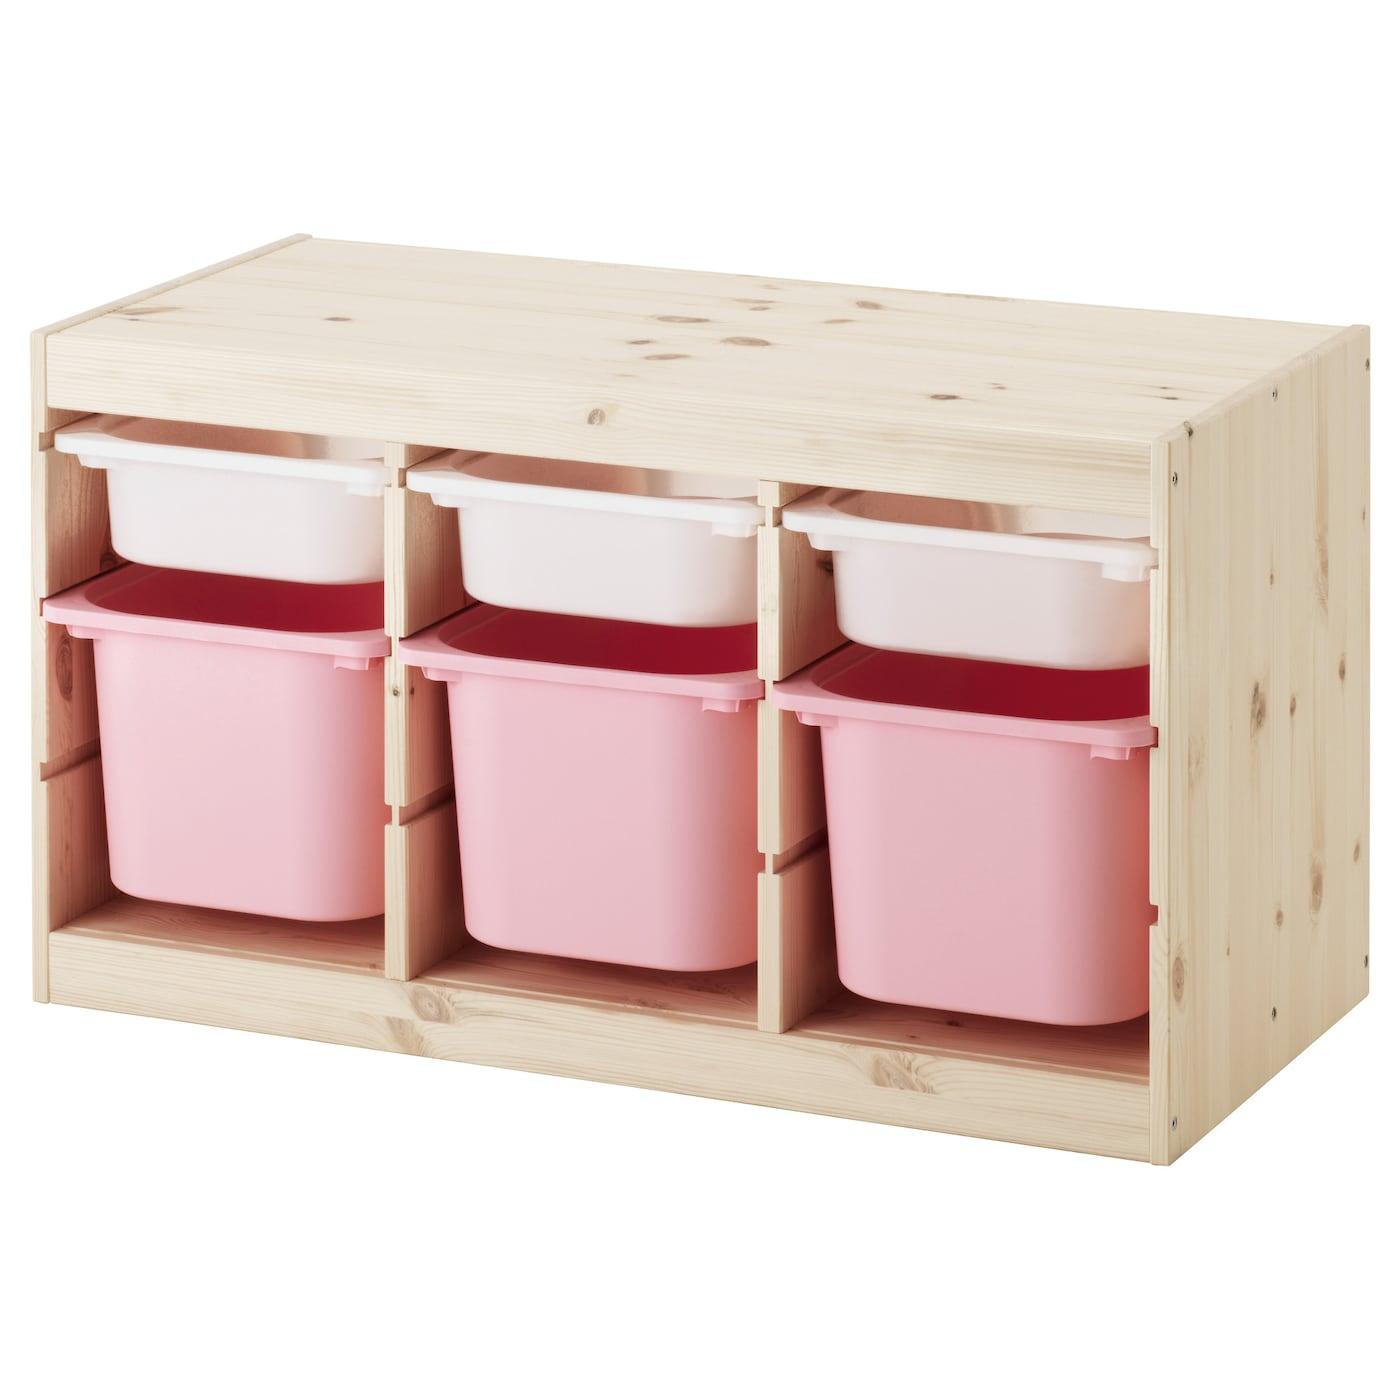 Ikea Meuble Case Fashion Designs # Meuble Ikea Case